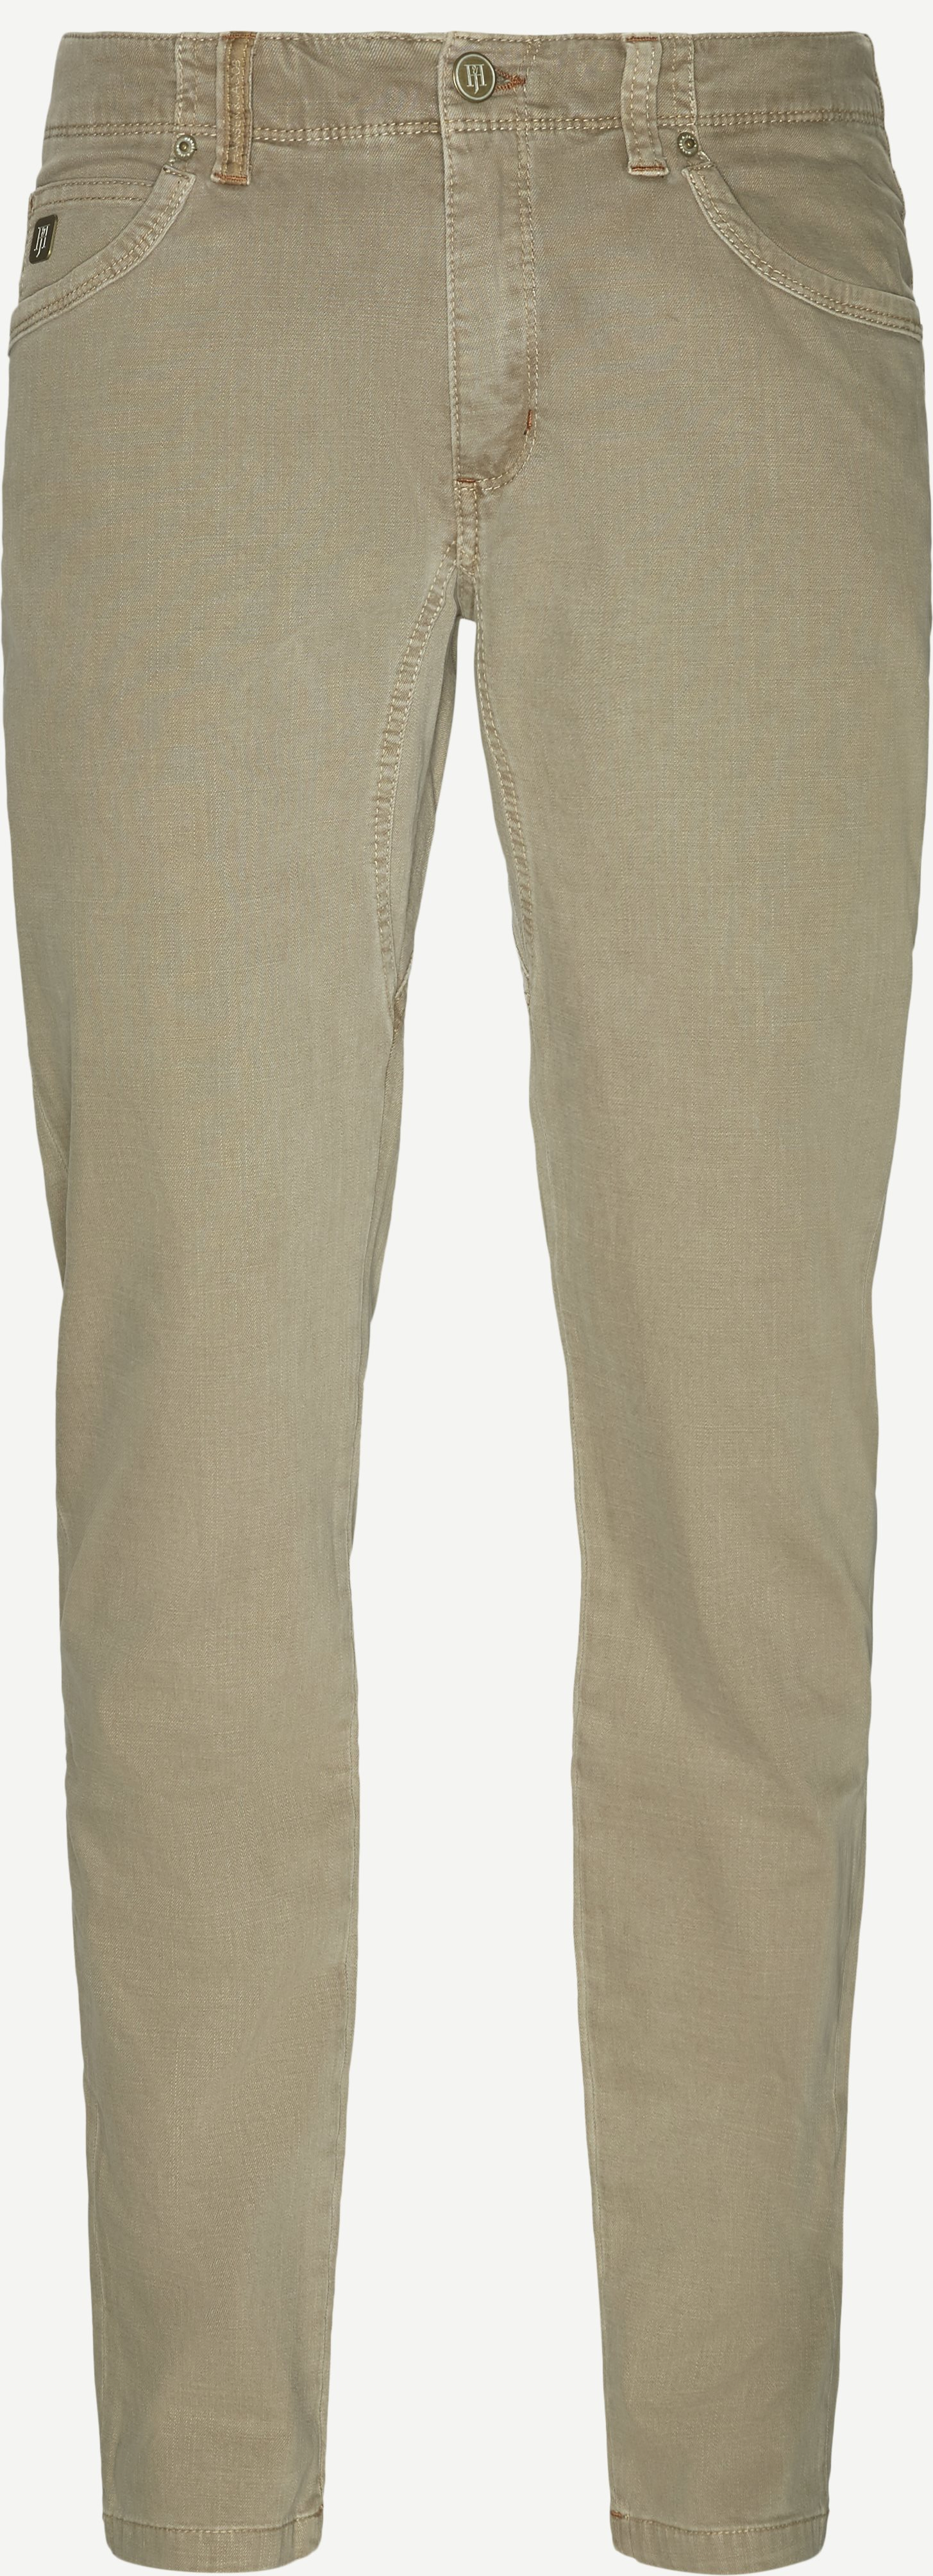 Jeans - Regular - Sand